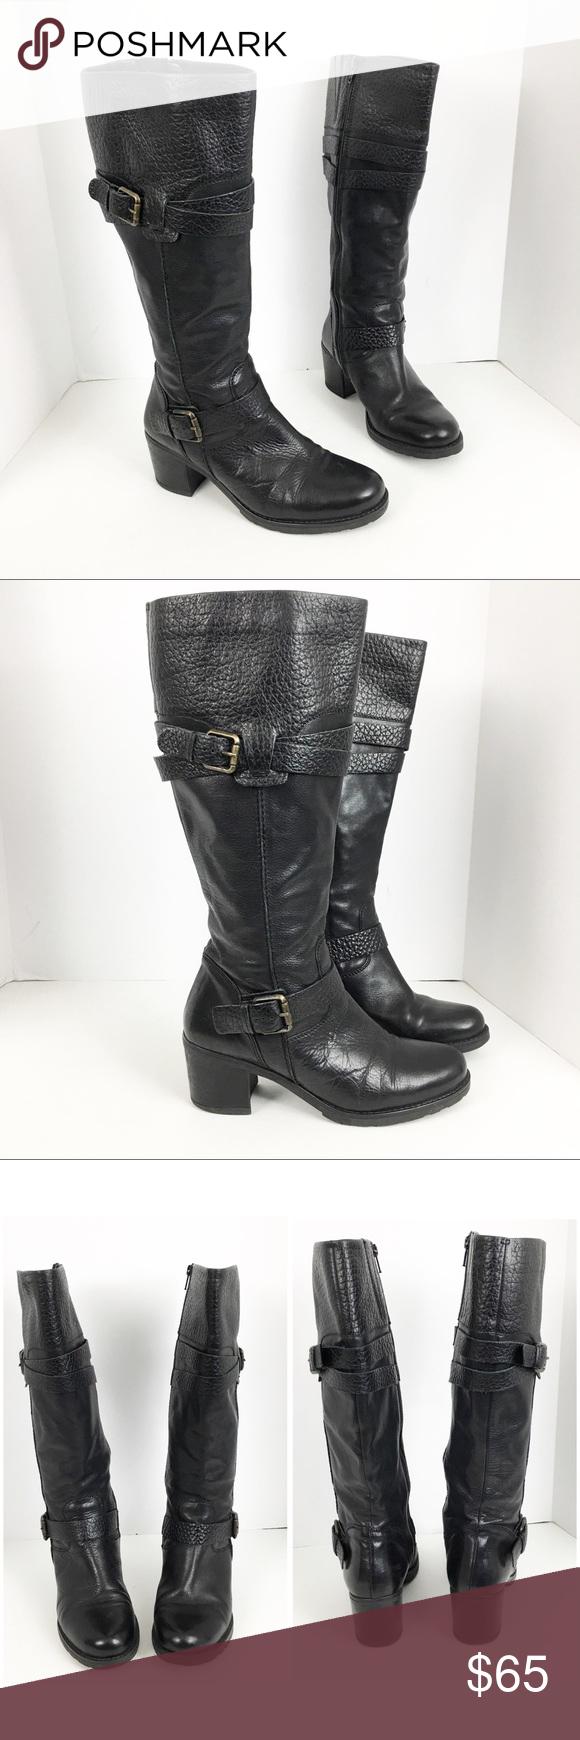 bdd4f97e6 Clarks Fernwood Oasis black leather boots sz 40/ 9 Clarks Fernwood Oasis black  leather buckles